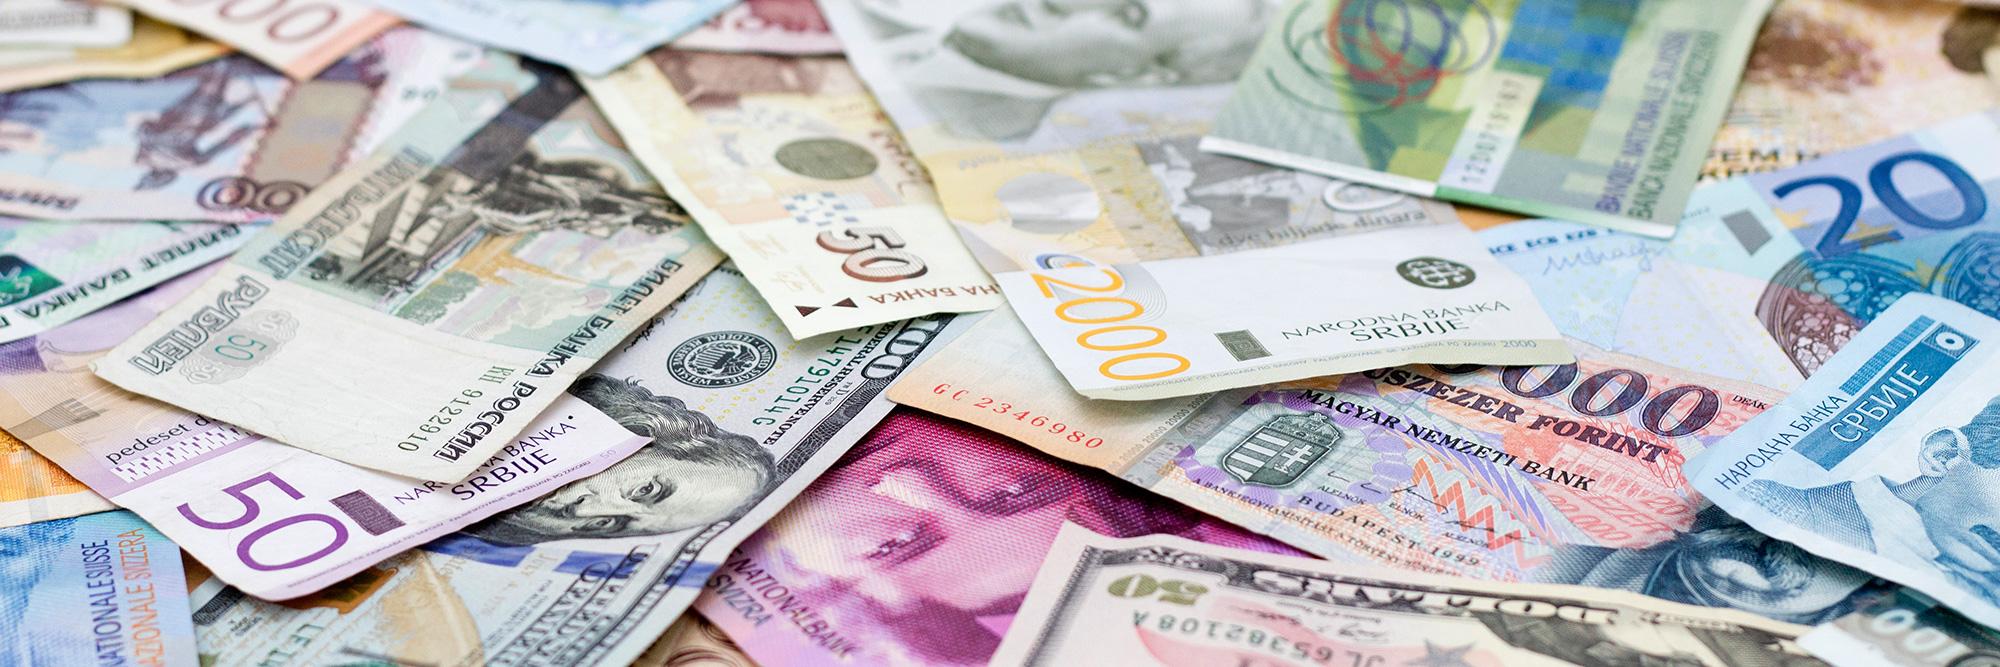 Euro Change Wechselstuben Ag